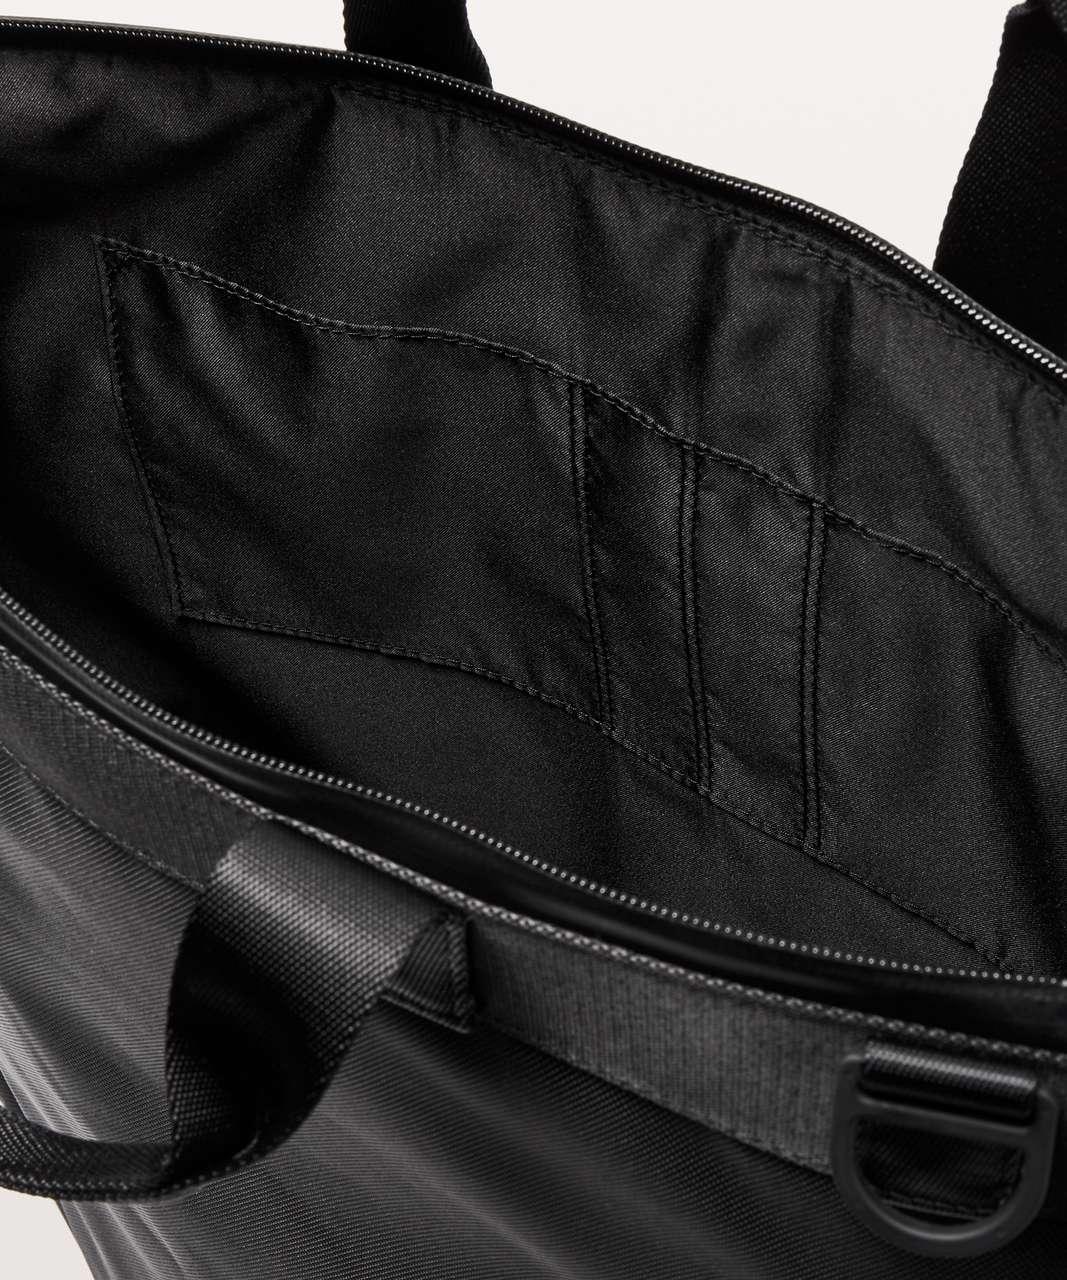 Lululemon Commission Bag *20L - Black